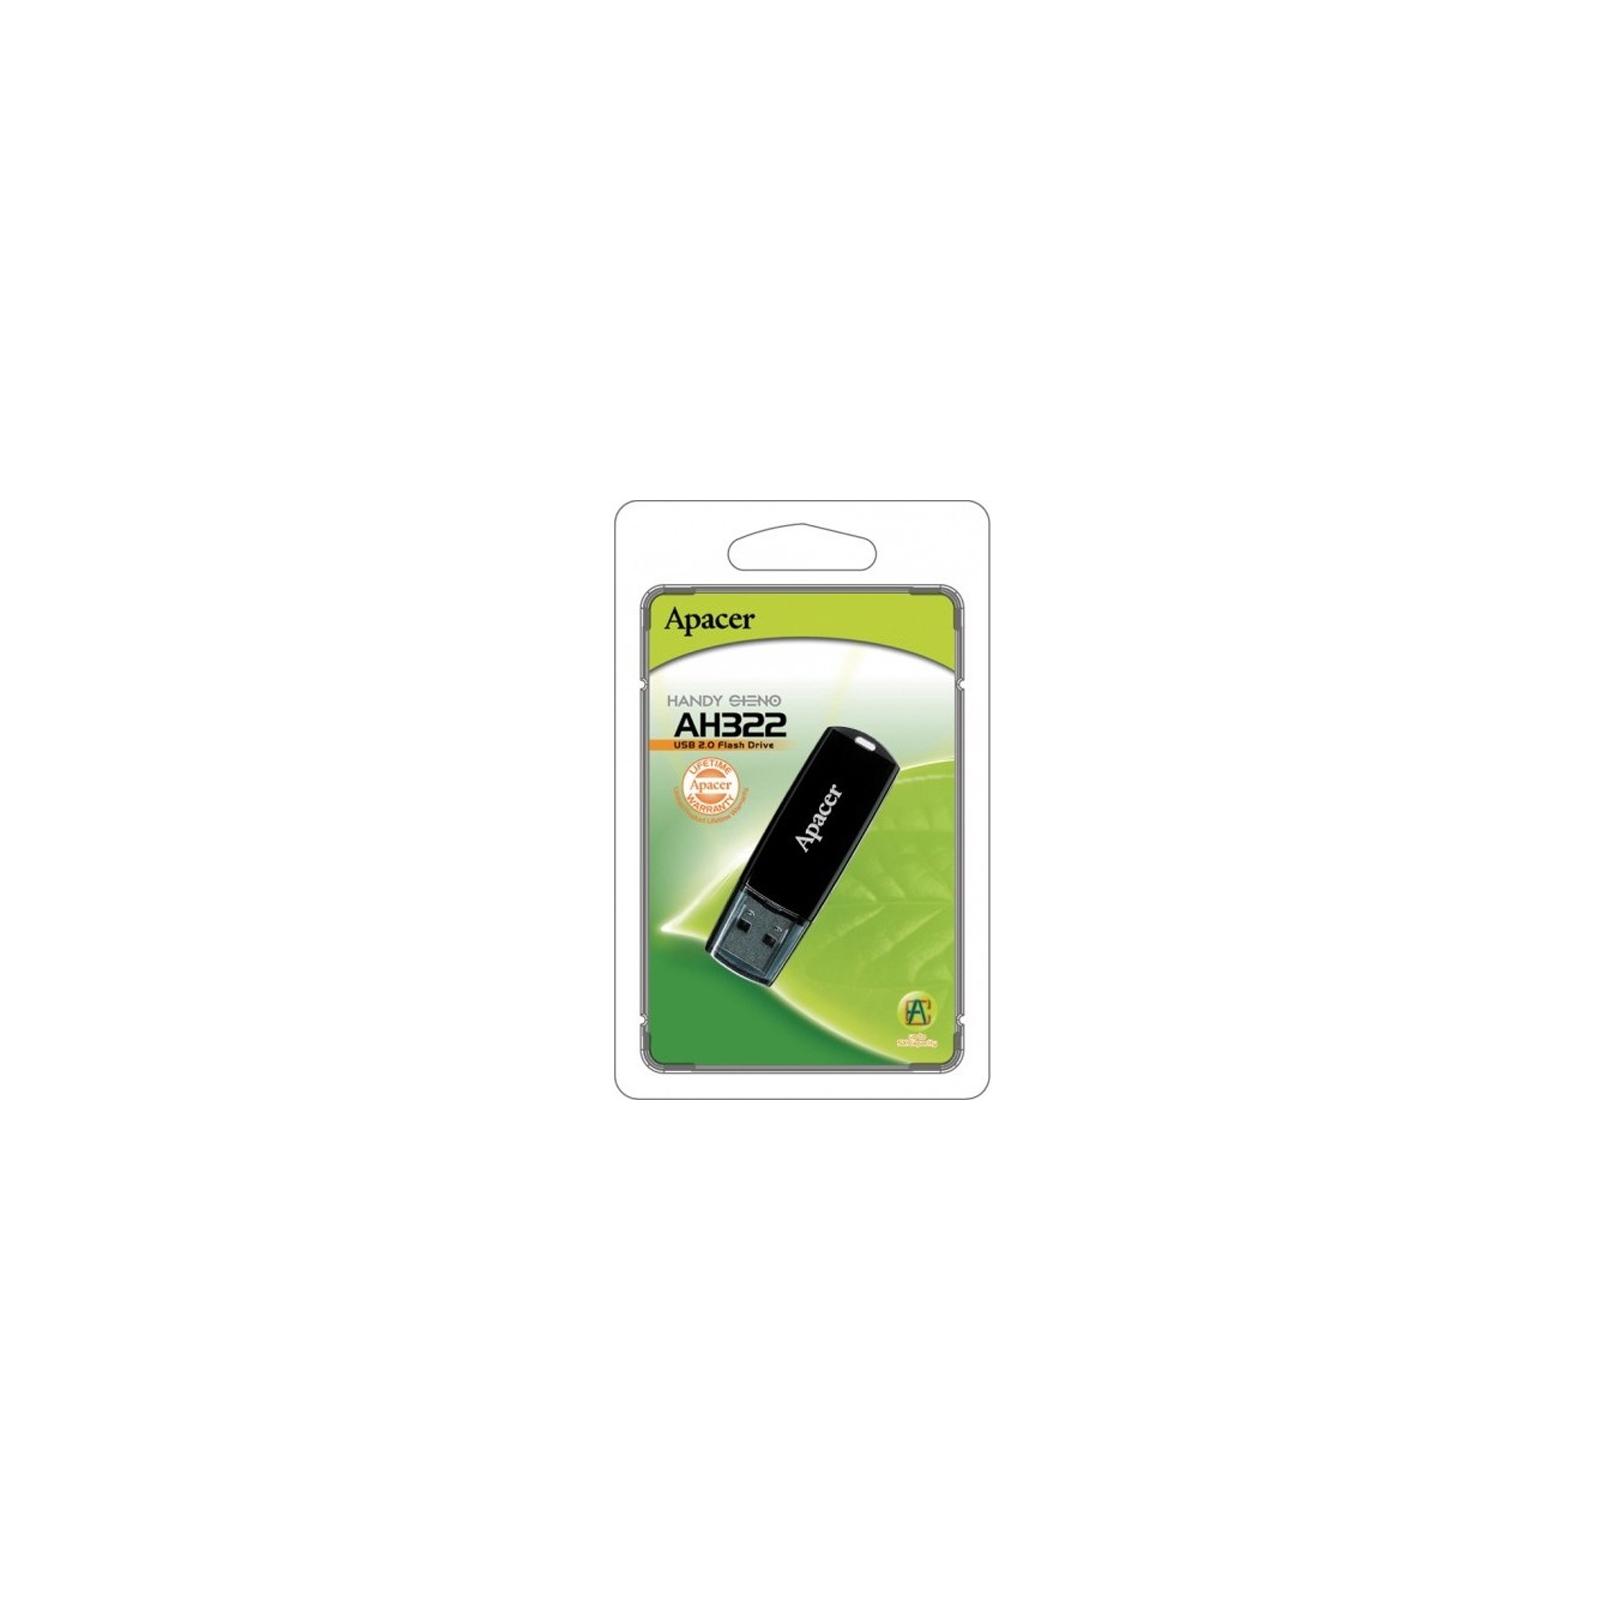 USB флеш накопитель Handy Steno AH322 black Apacer (AP8GAH322B-1) изображение 4